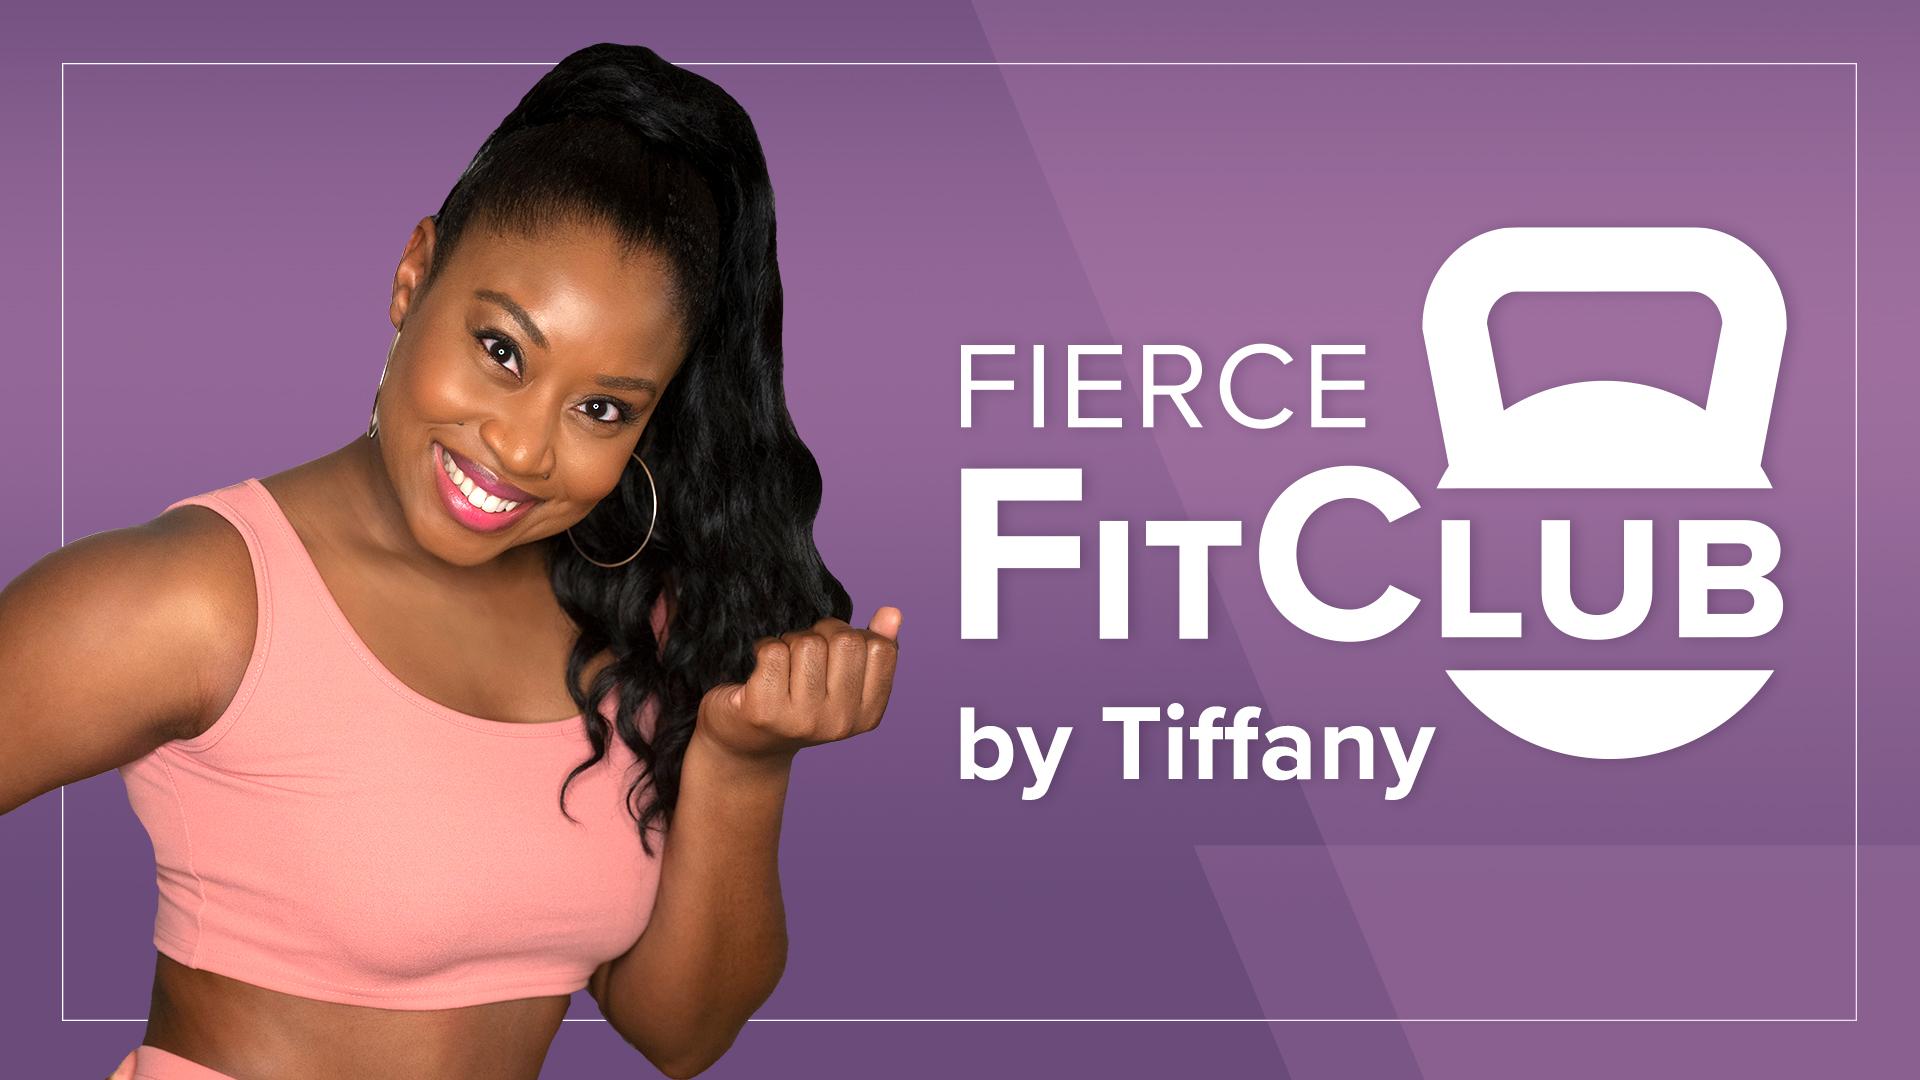 Fierce Fit Club By Tiffany on Amazon Prime Video UK